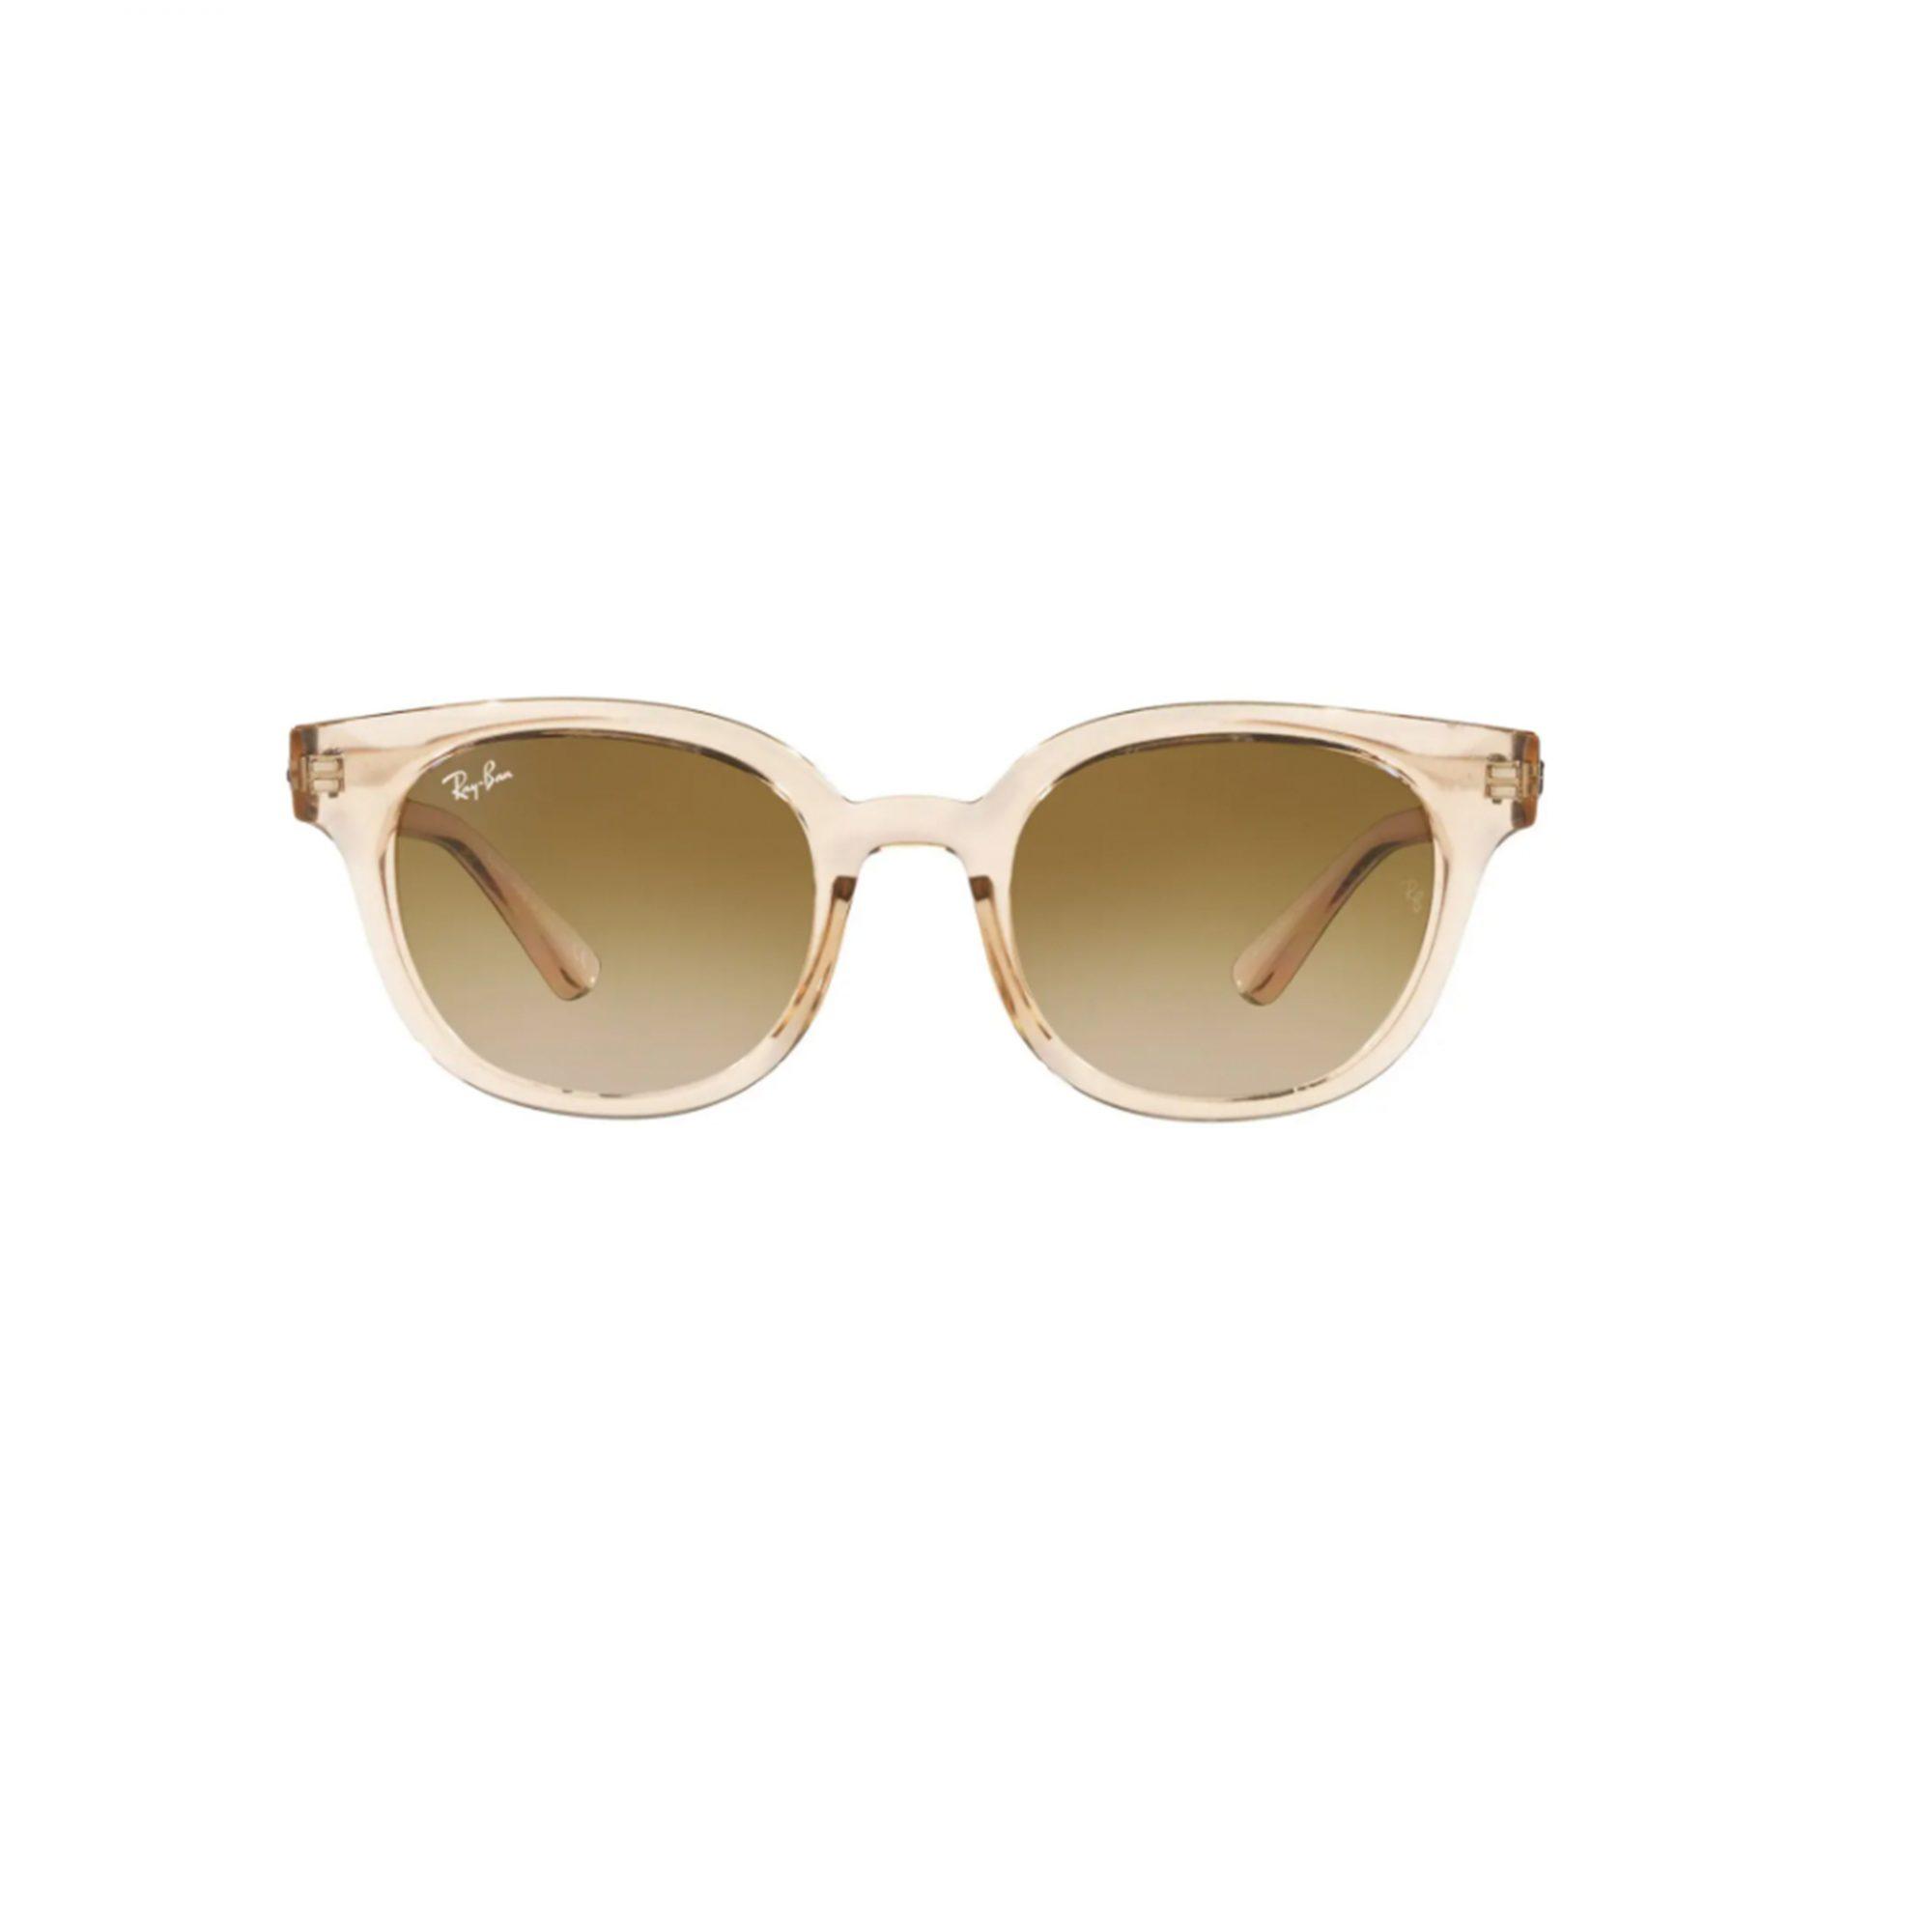 rayban-cat-eye-sunglasses, nordstrom-anniversary-sale